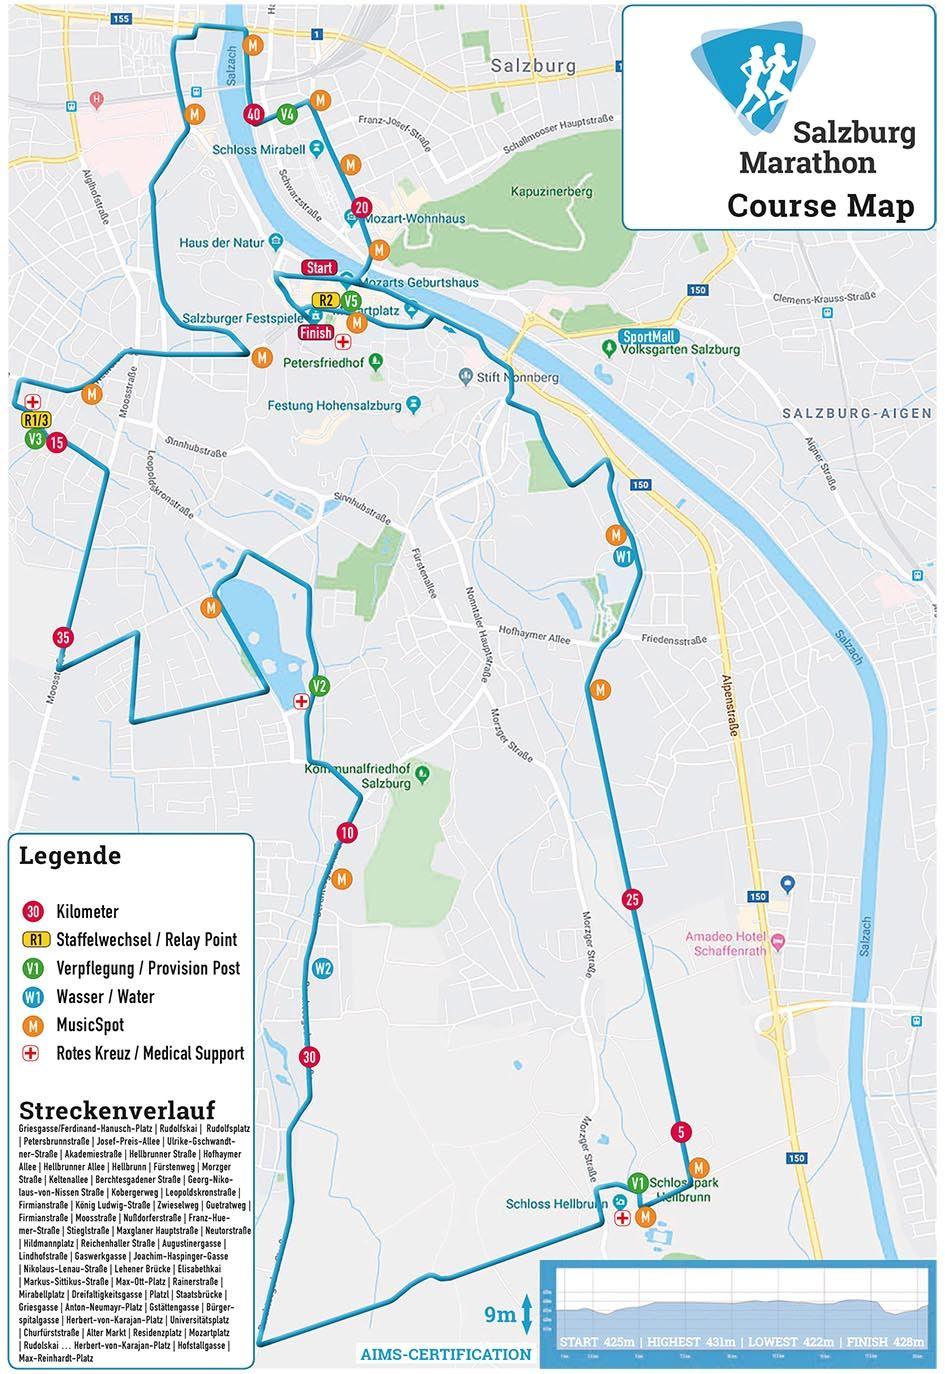 Salzburg Marathon Routenkarte